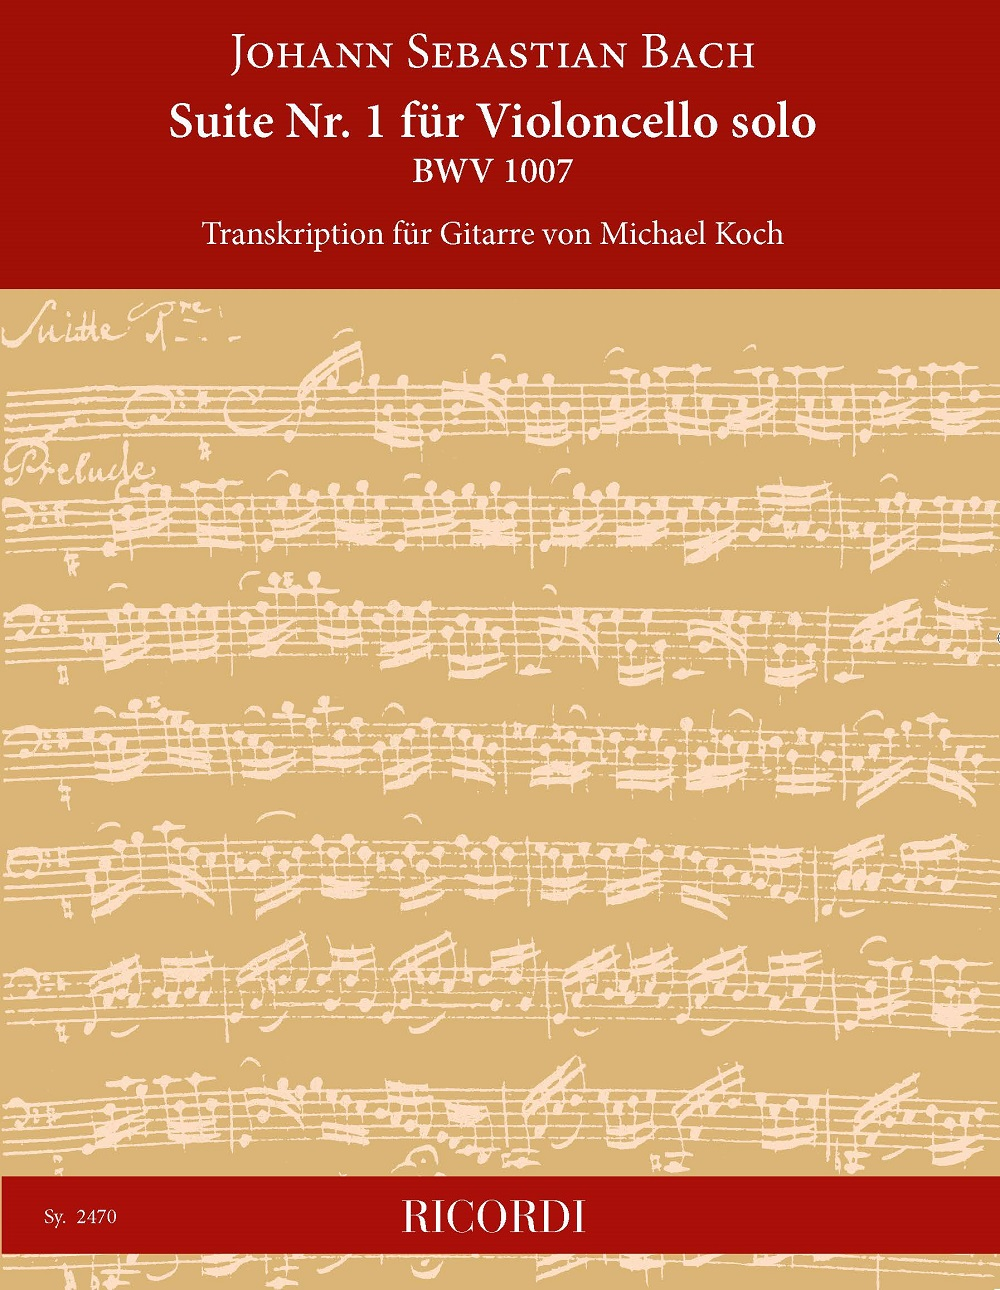 Johann Sebastian Bach: Suite Nr. 1 für Violoncello solo BWV 1007: Guitar: